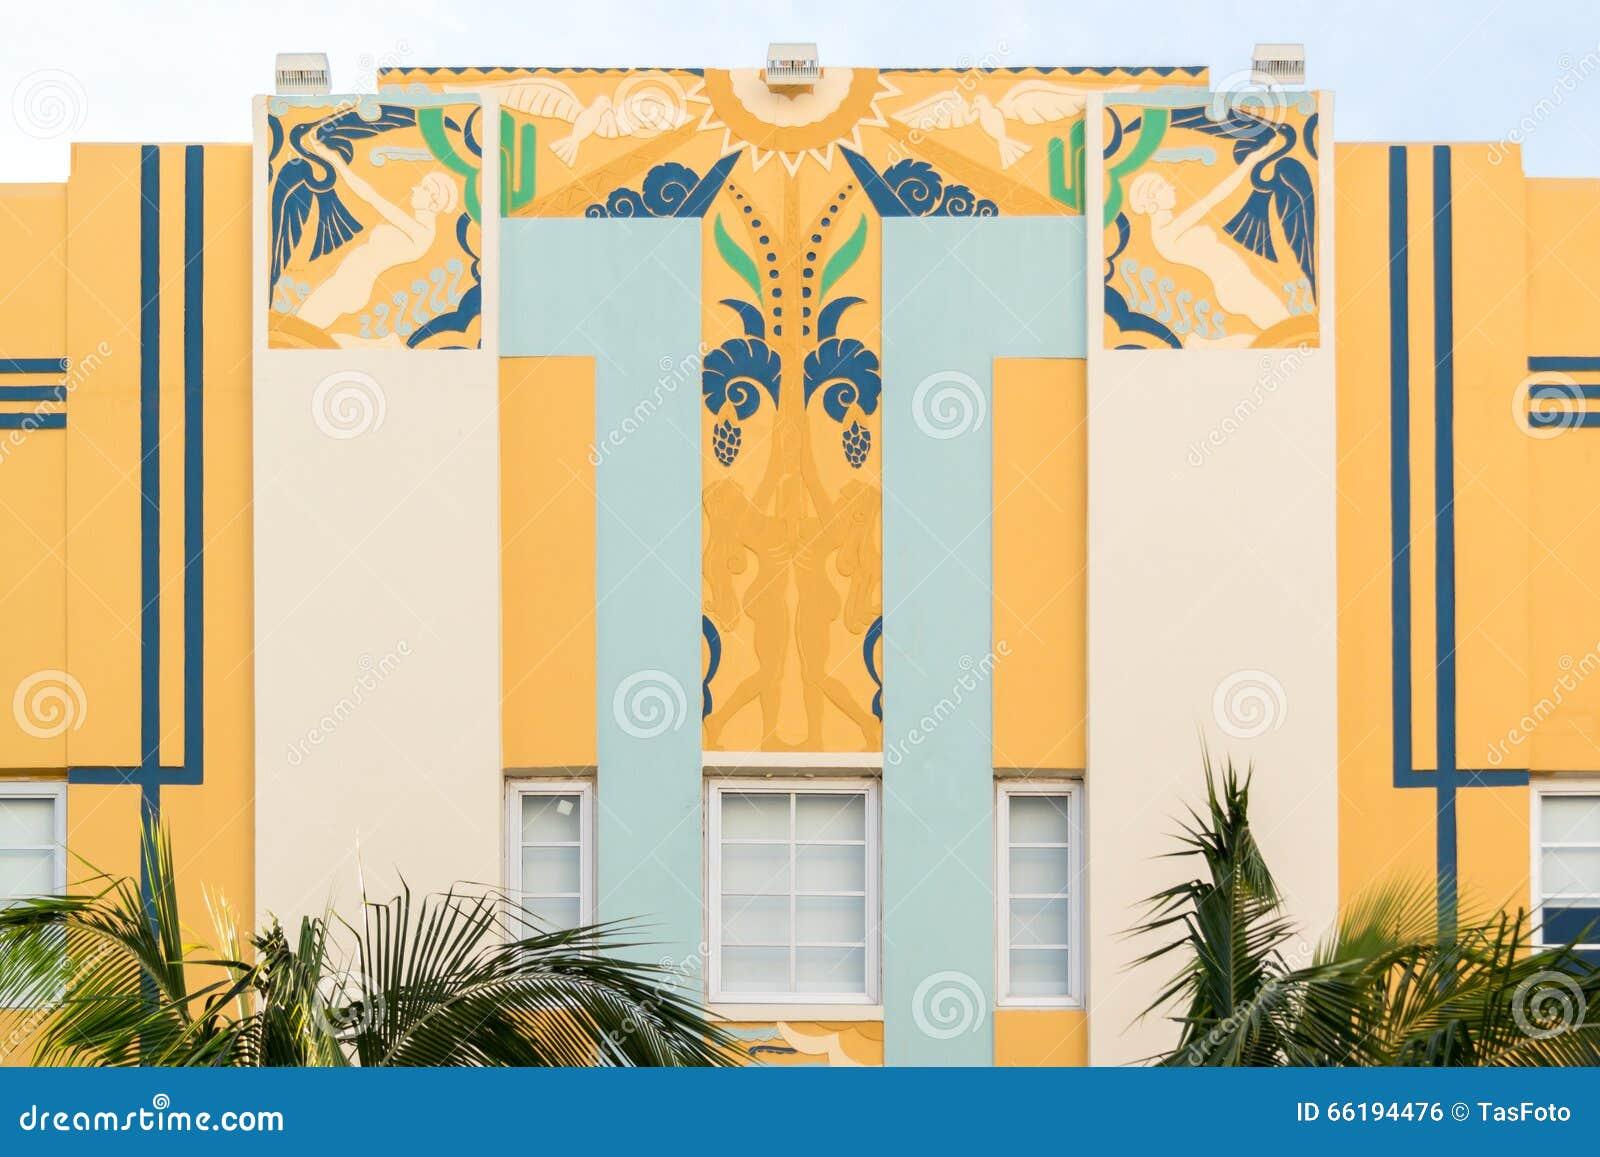 art deco building in miami beach florida editorial photo image of